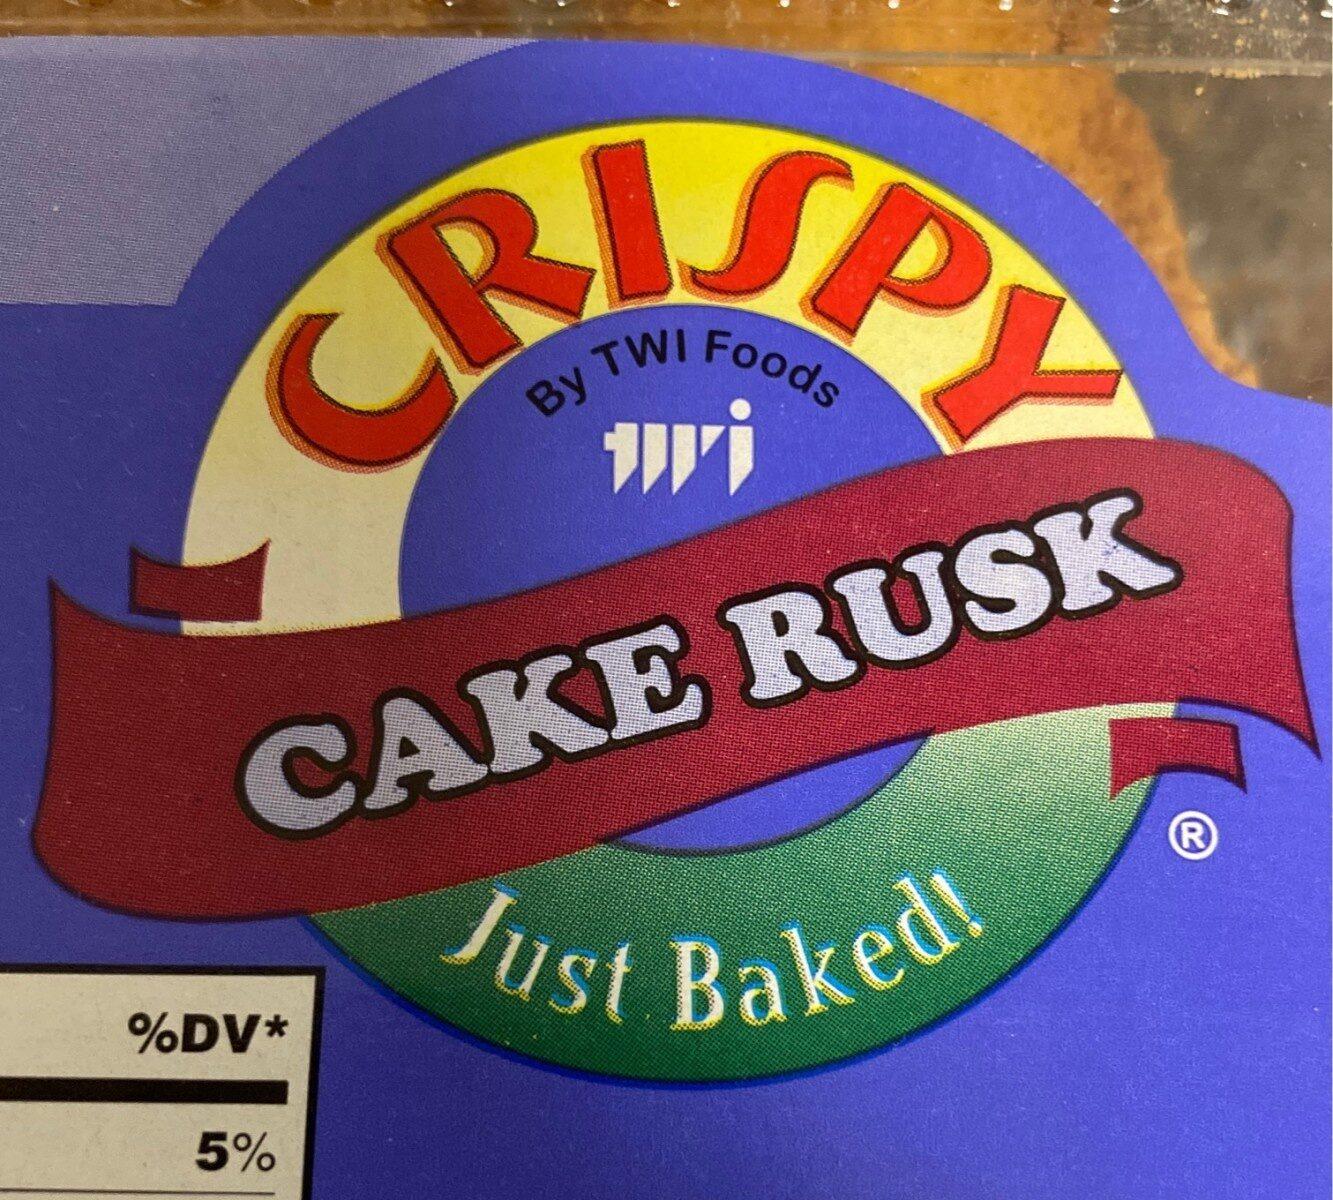 Crispy rusk cake - Product - en